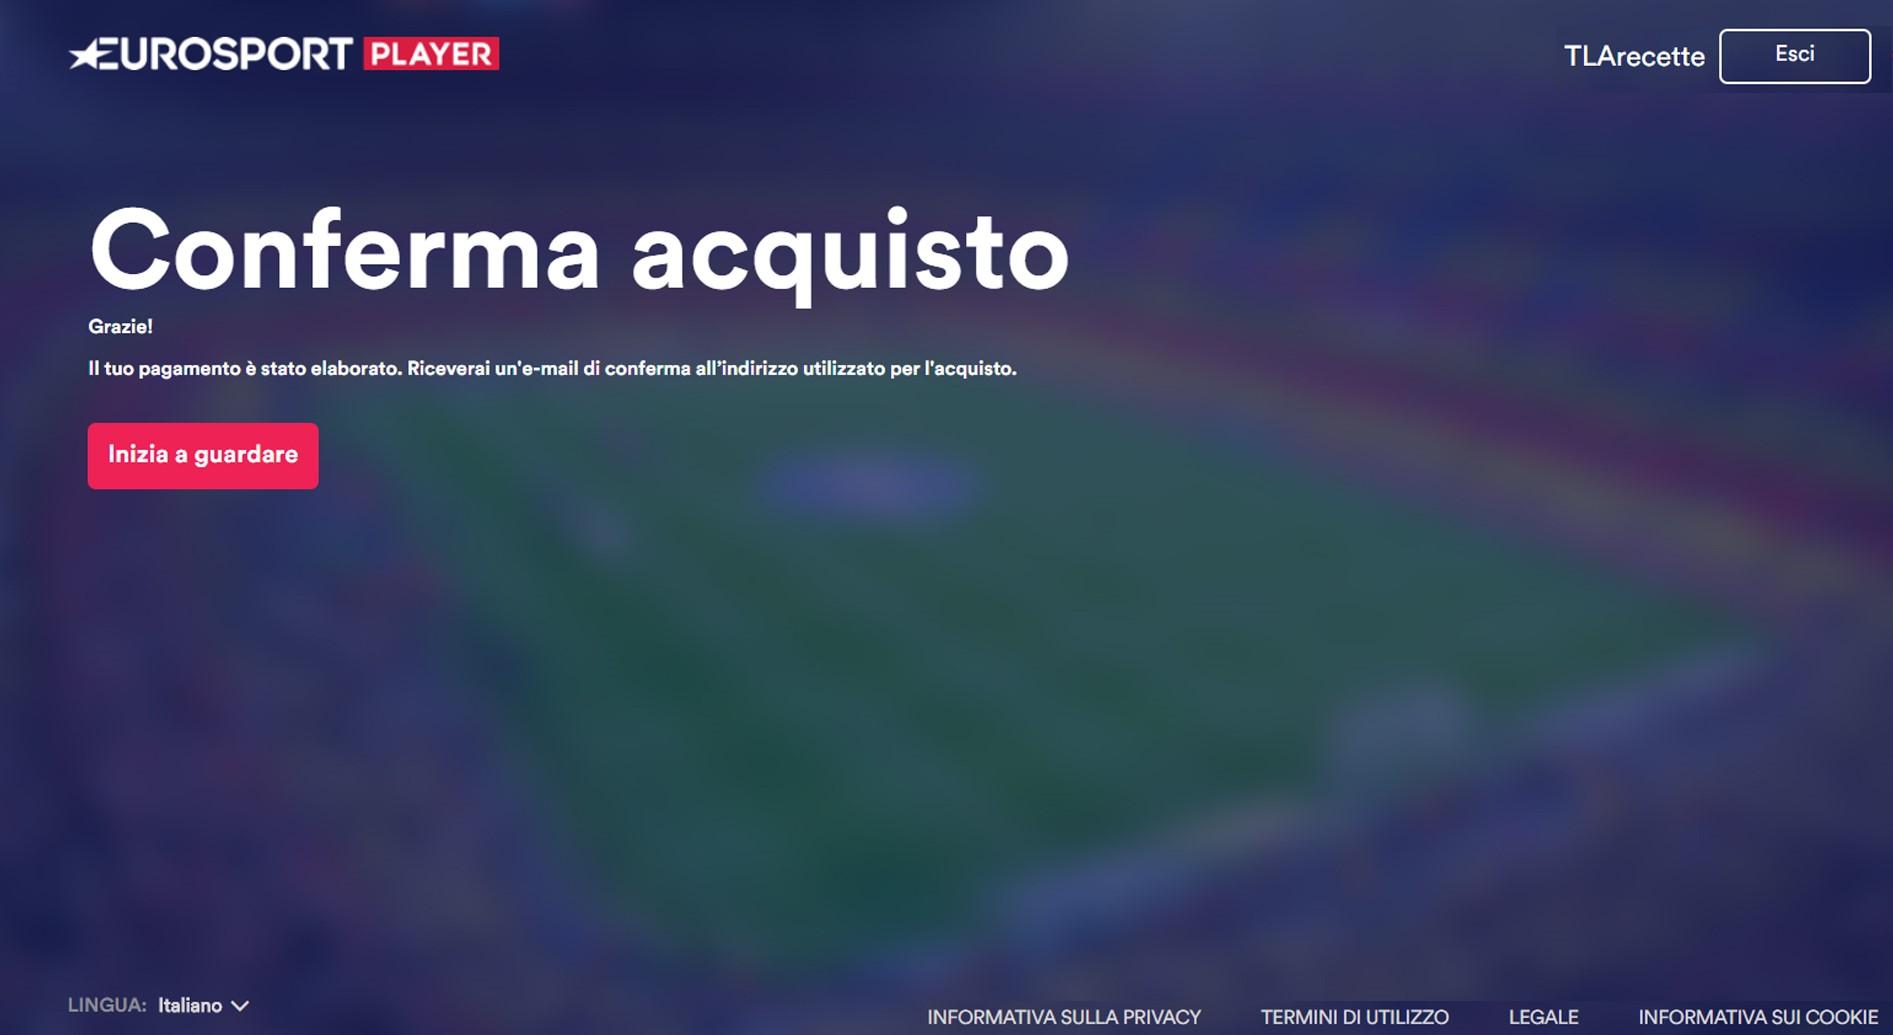 Eurosport Player - 6